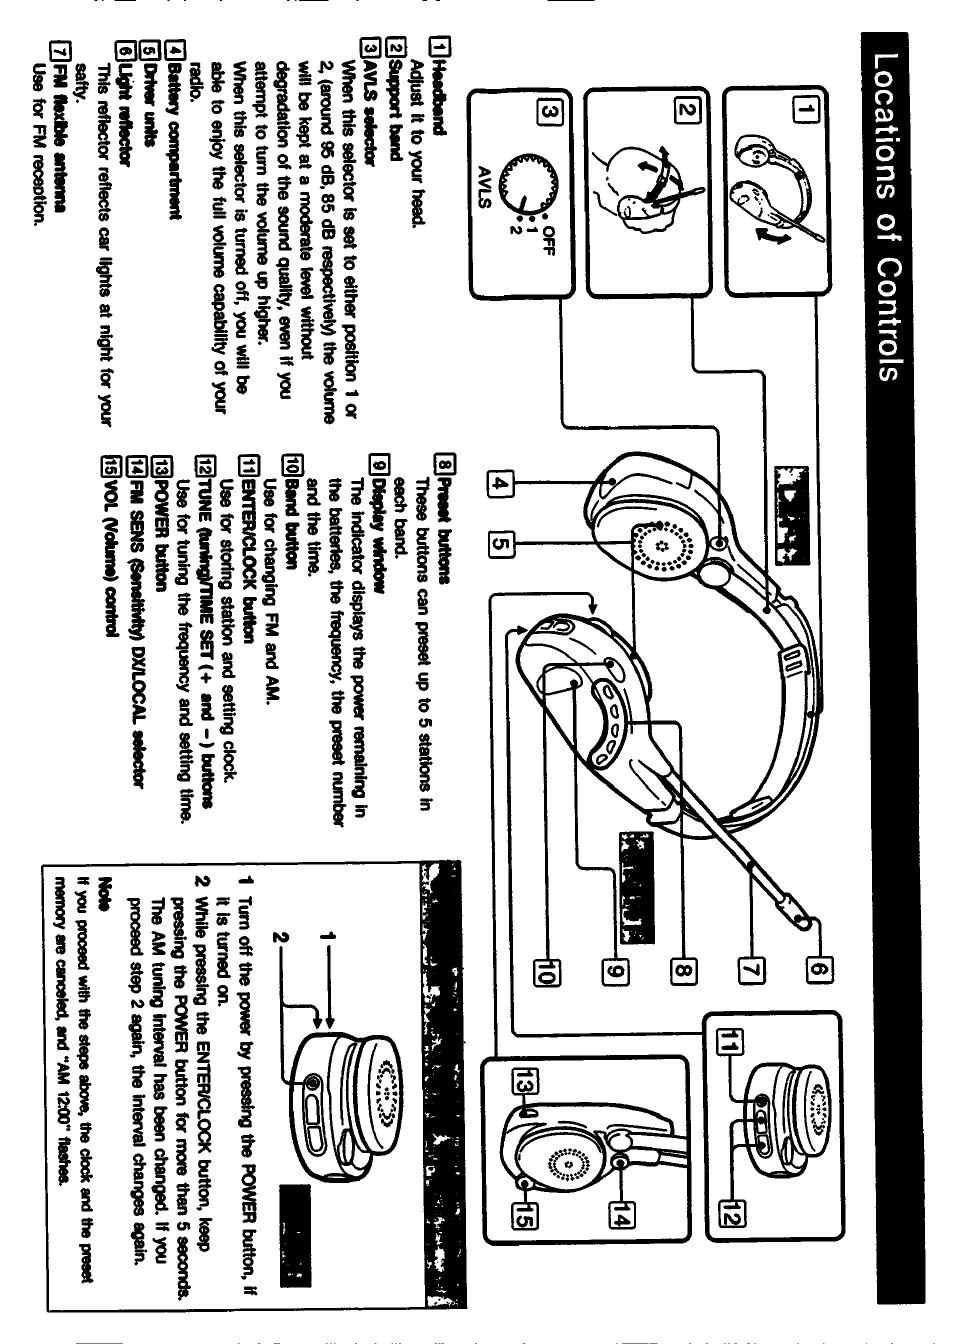 Locations of controls, M ilexms antenna, Dsupport band